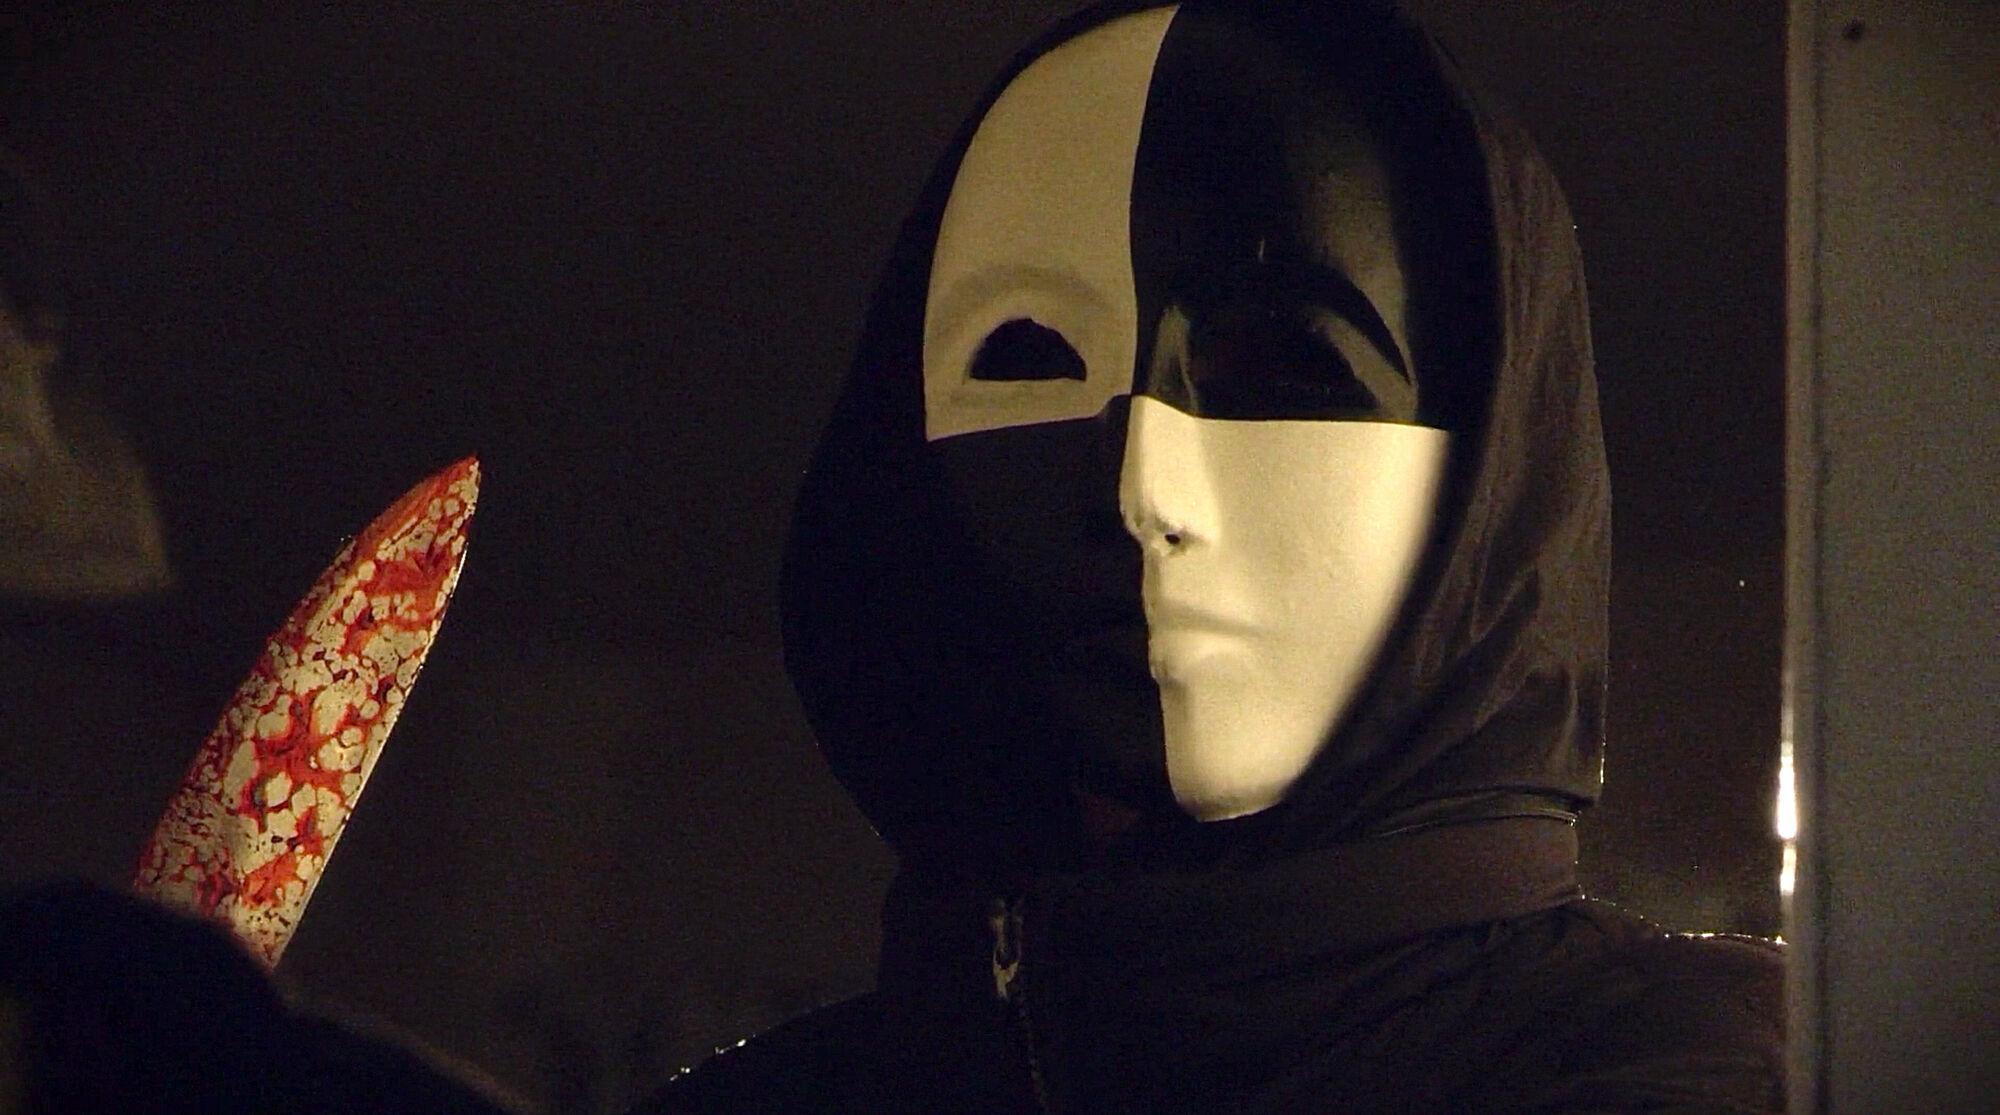 Sick and Evil | Criminal Minds Wiki | FANDOM powered by Wikia